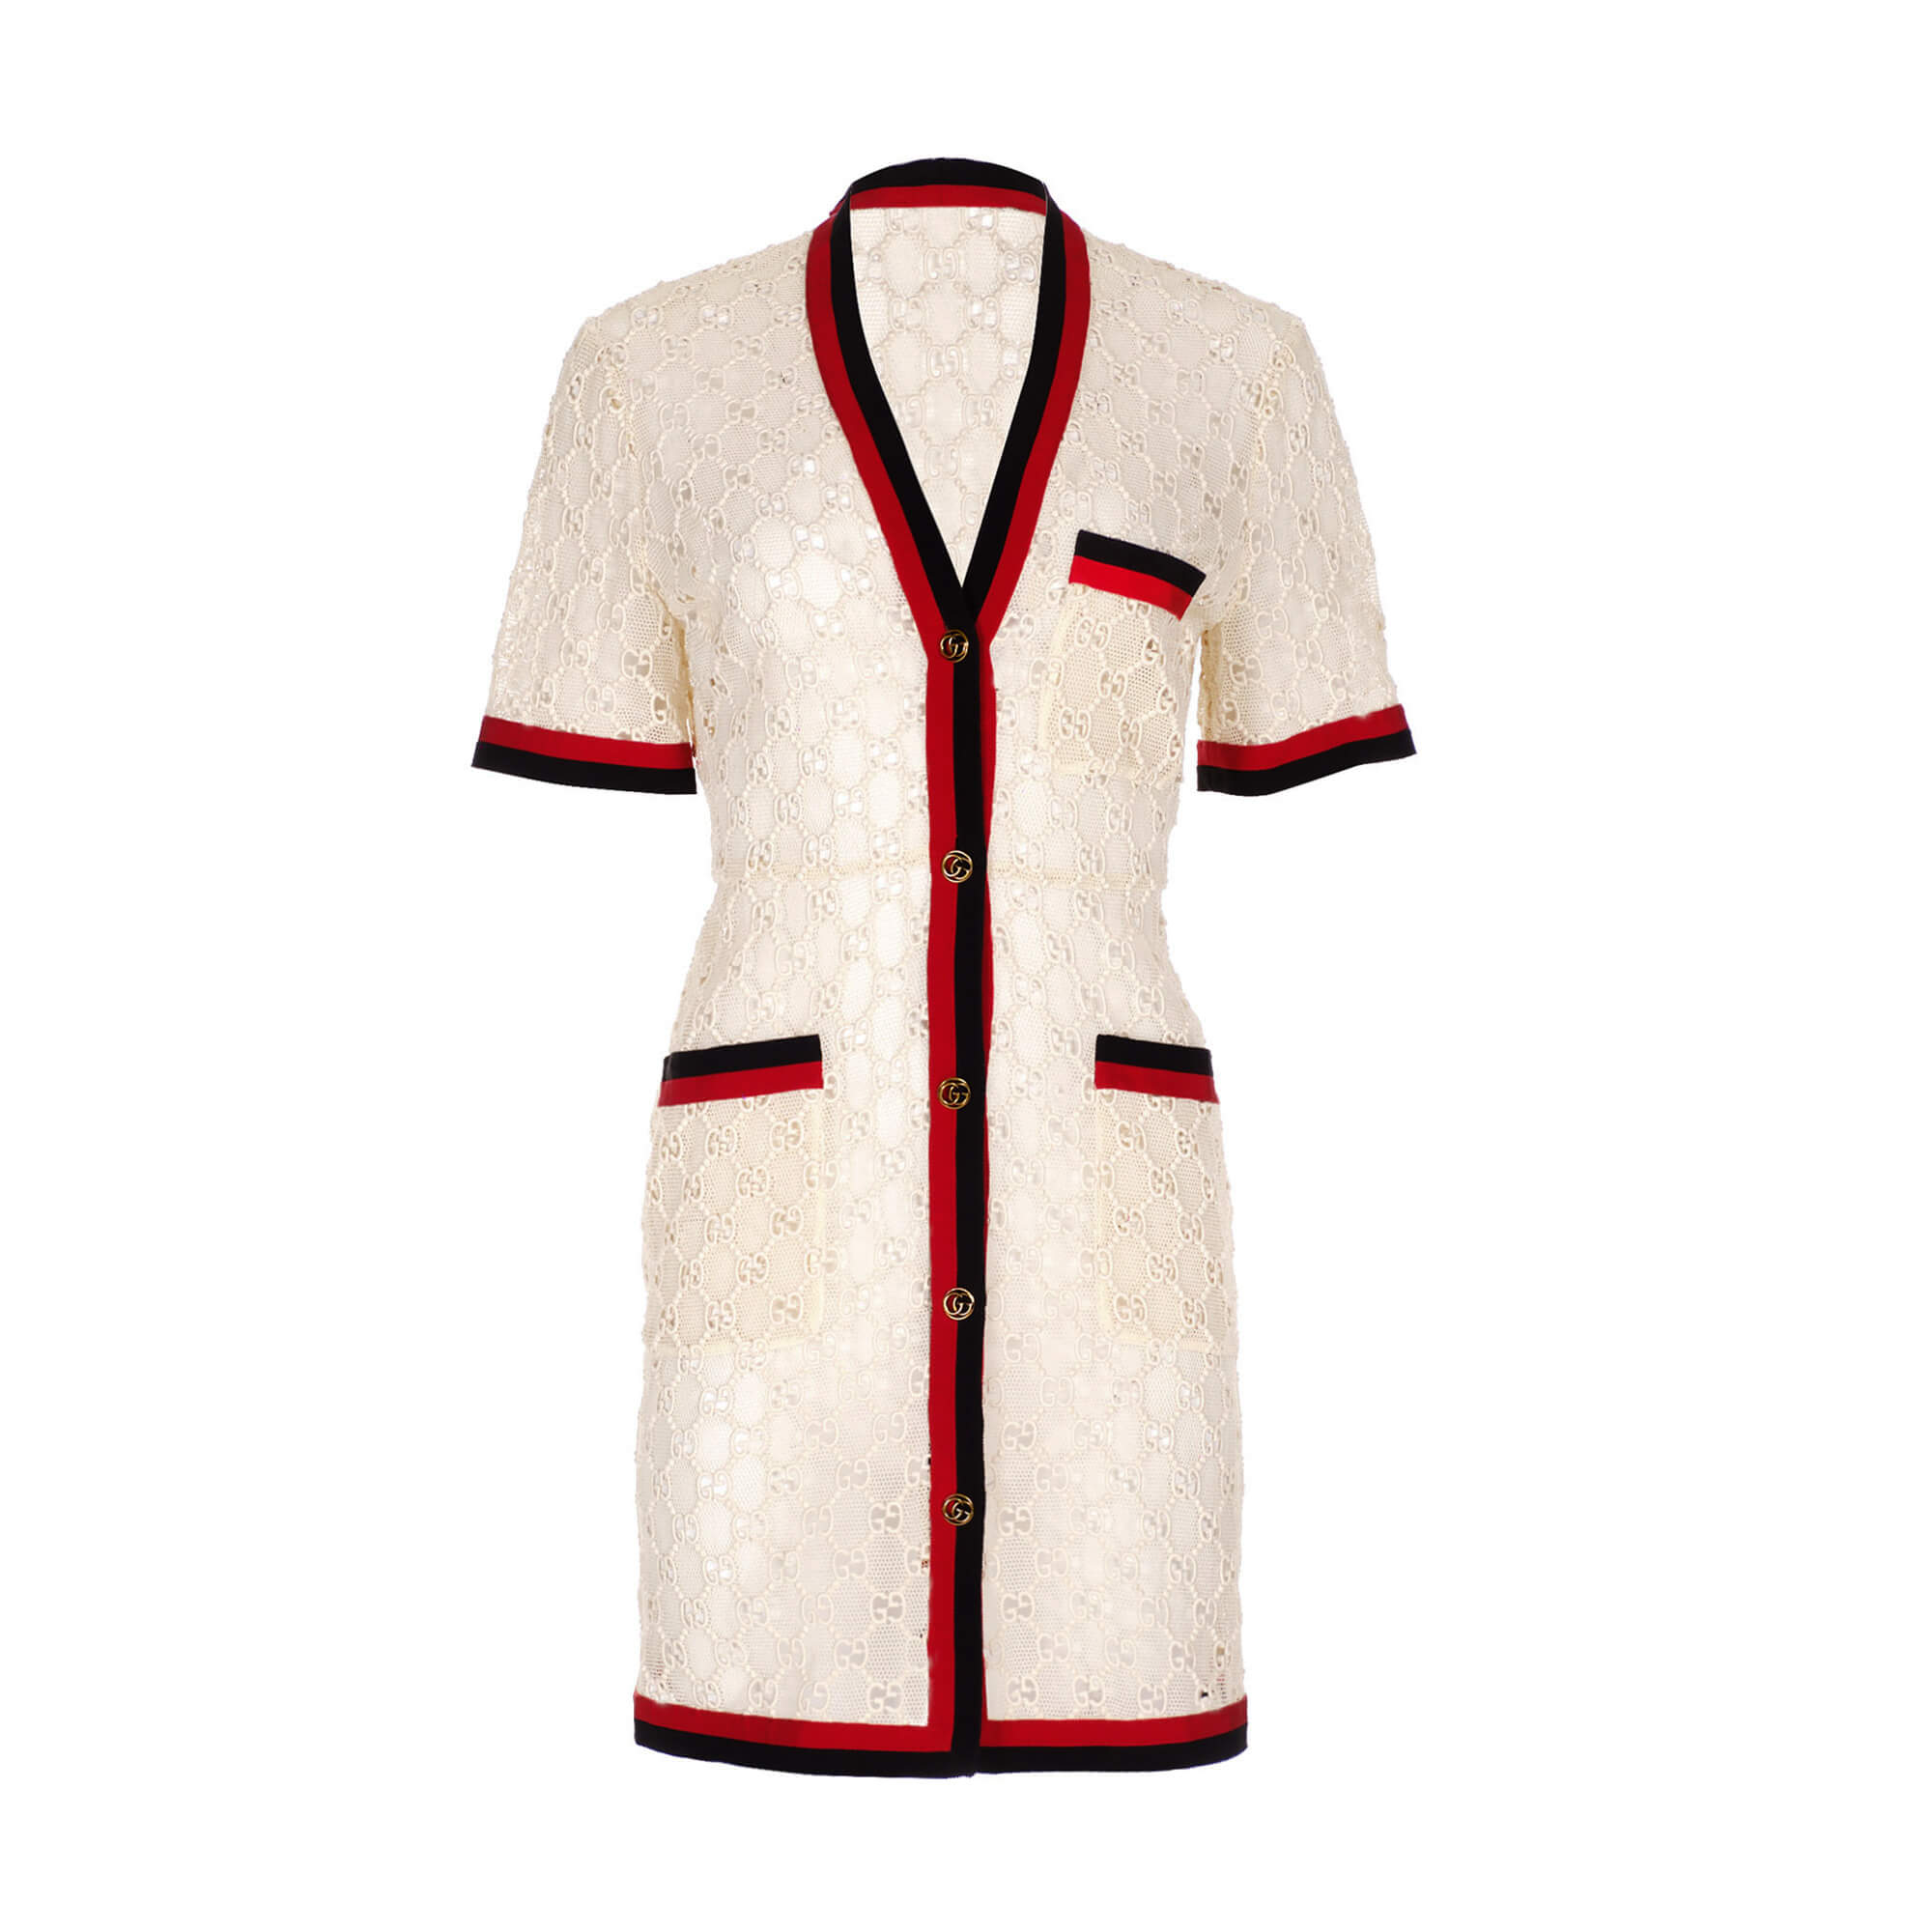 Women Gucci Short Sleeve Button Dress -  White Size S IT 42 US 6